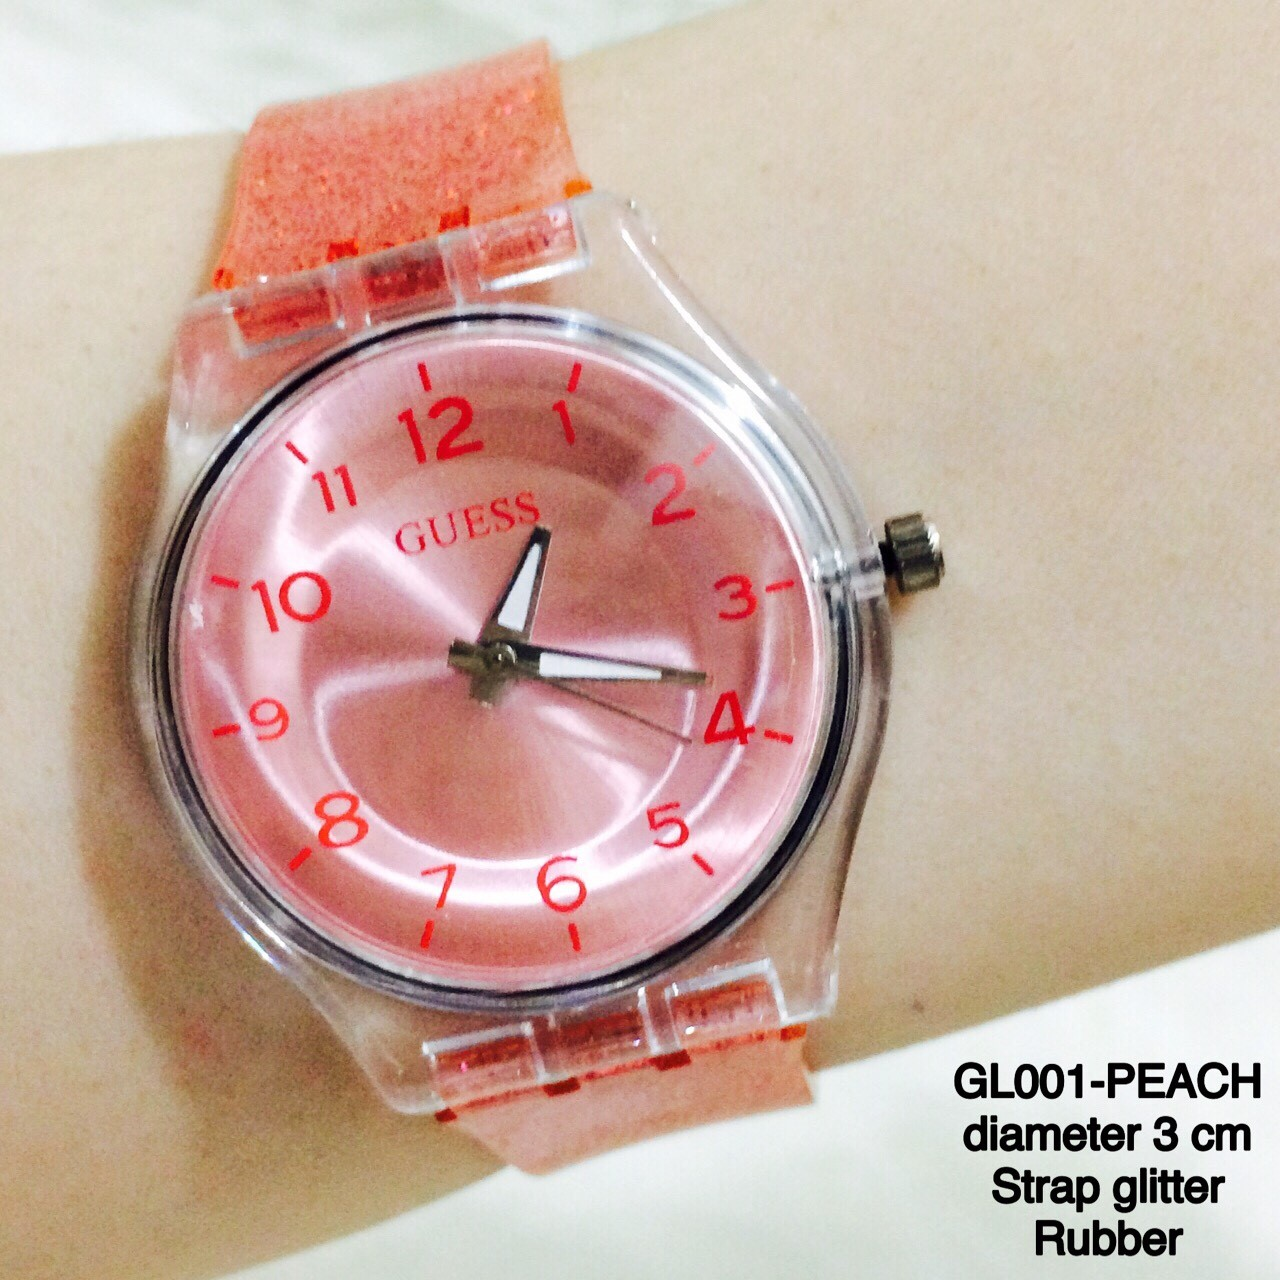 Jual Jam Tangan Wanita Guess Glitter Monol Glossy Sporty Swatch Tali Bahan Karet Watch Holic Tokopedia